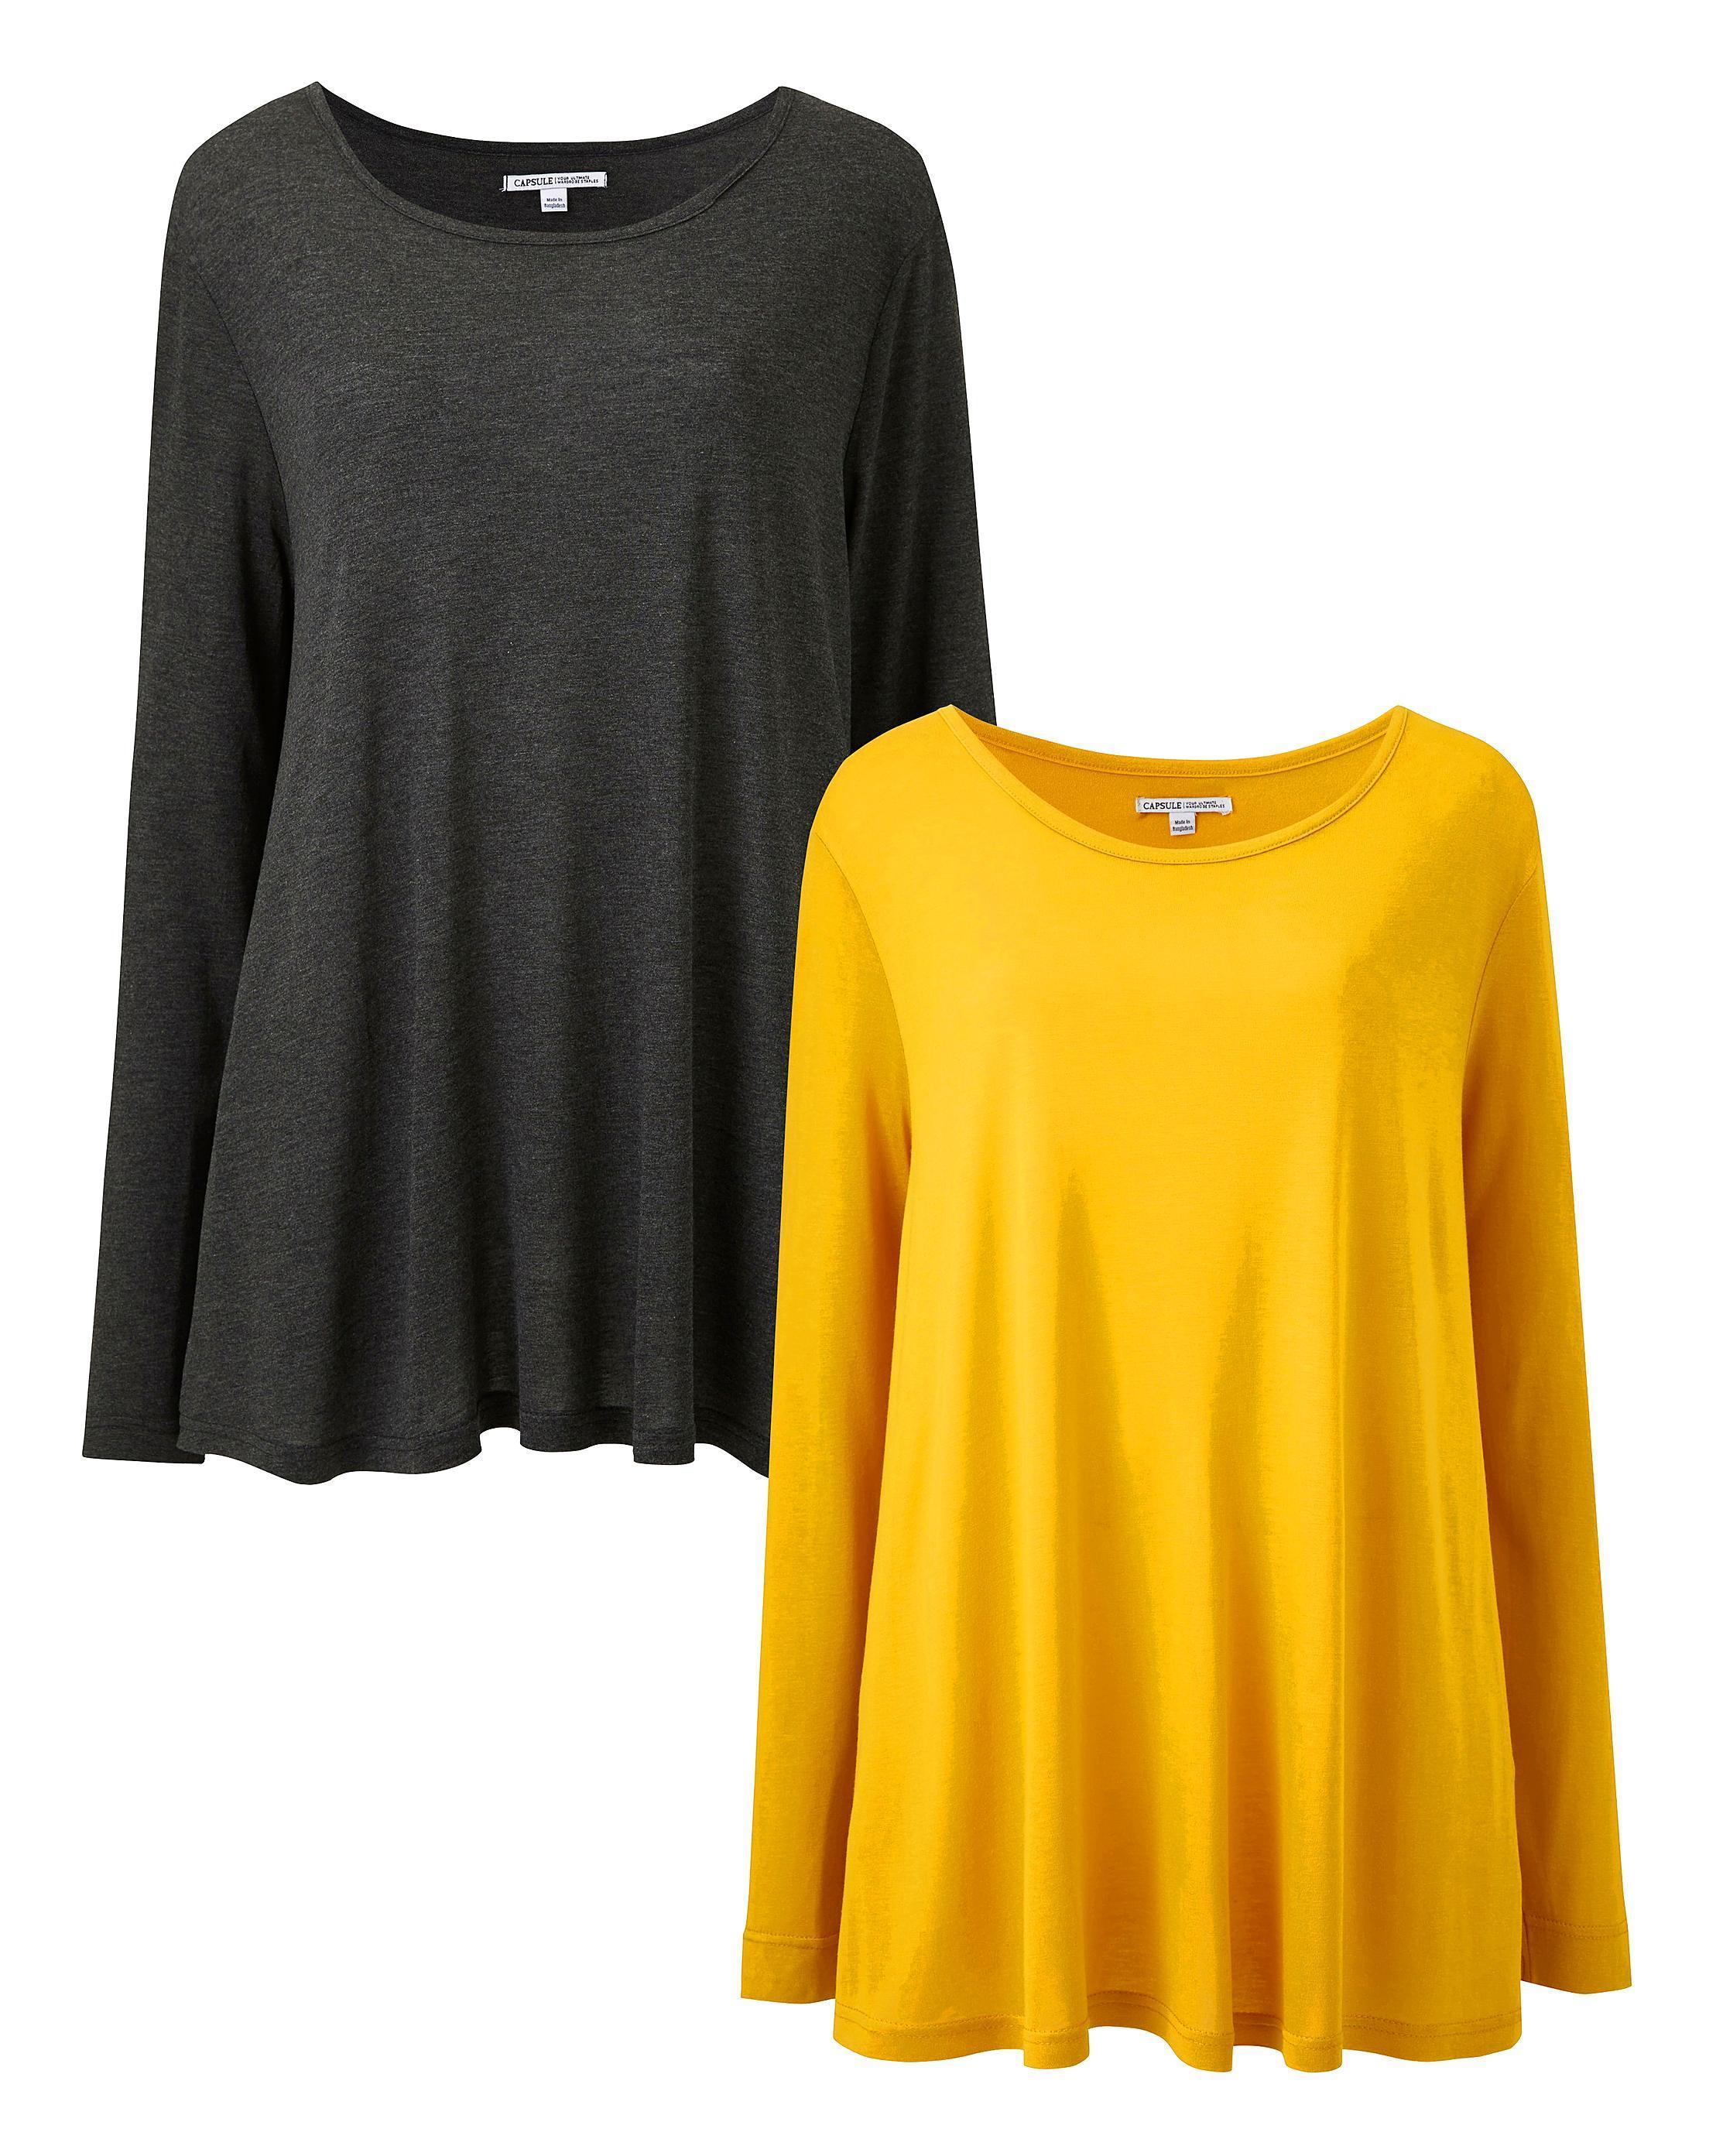 503b242d309859 Lyst - Simply Be 2 Pack Long Sleeve Swing Tops